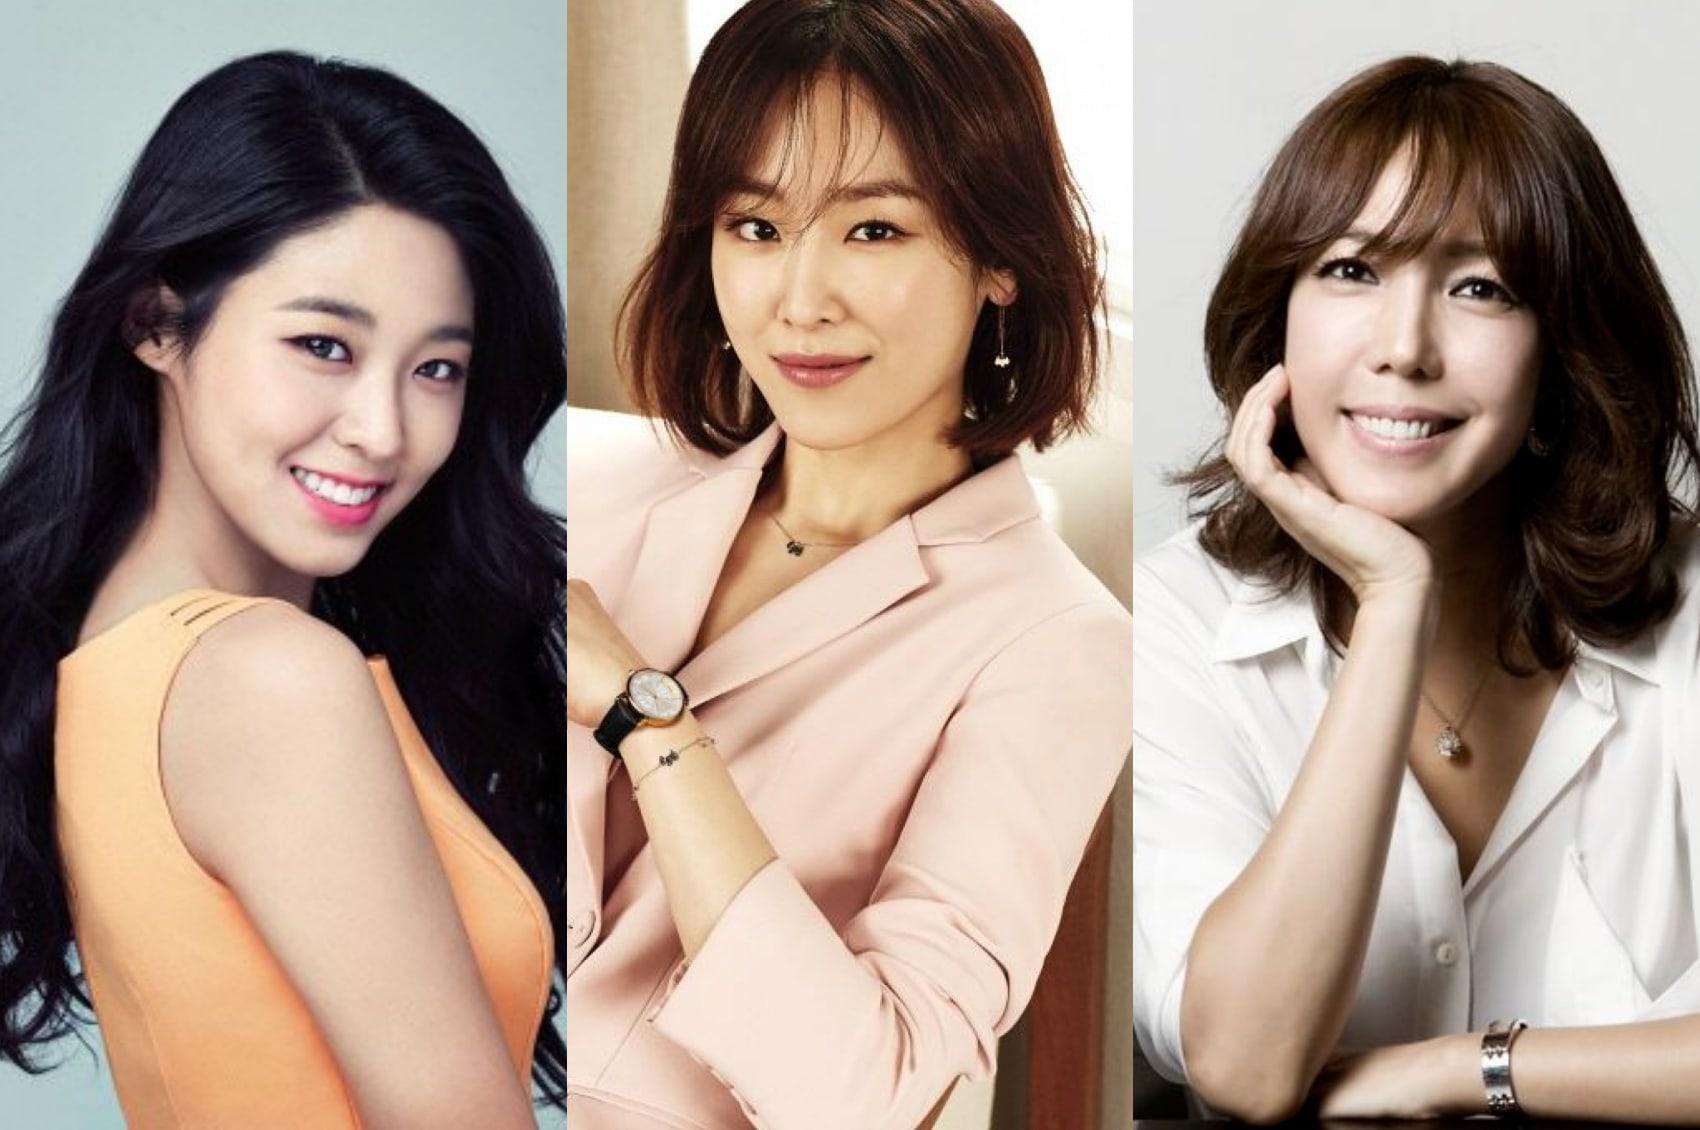 AOA's Seolhyun, Seo Hyun Jin, And Jun Soo Kyung Donate To Aid Pohang Earthquake Relief Efforts